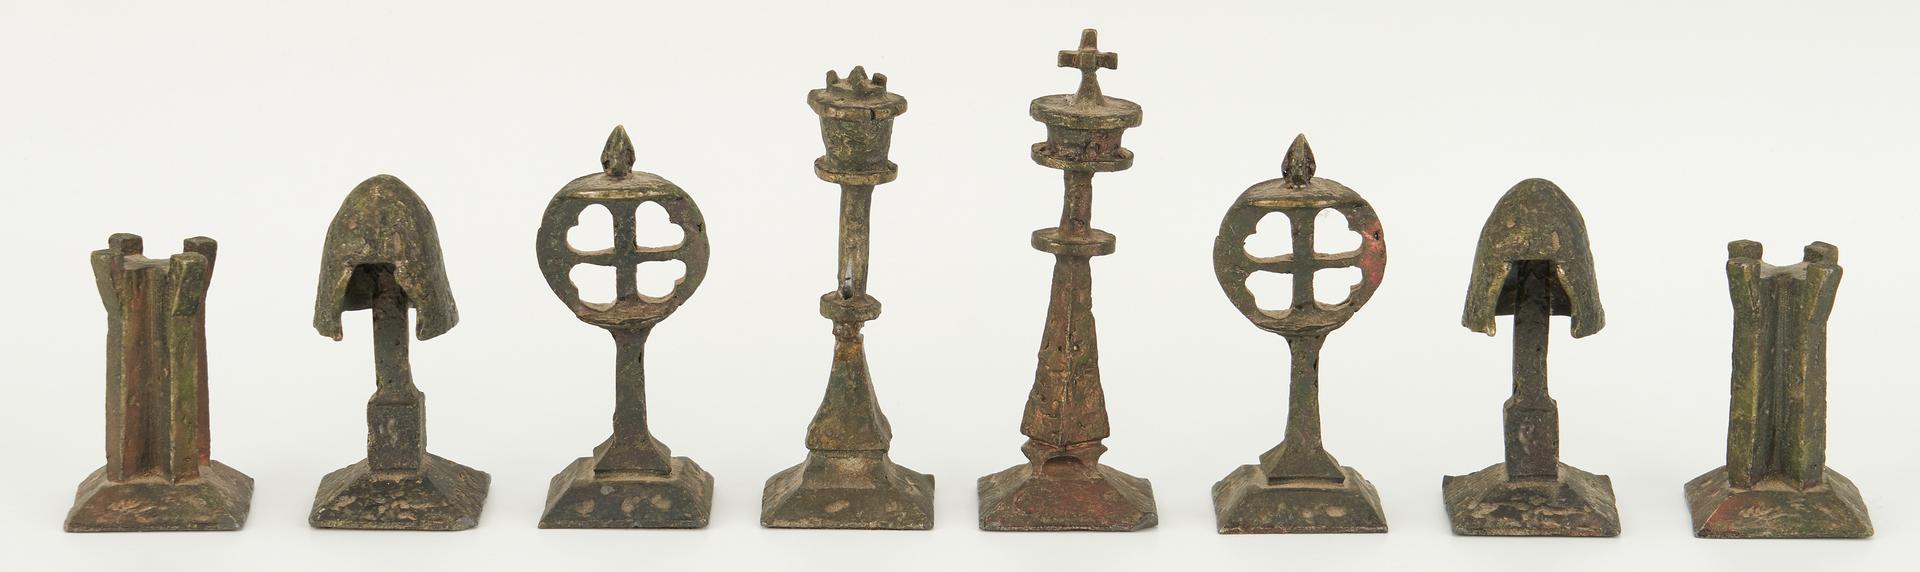 Lot 551: Richard L. Synek/Charles Martel Chess Set